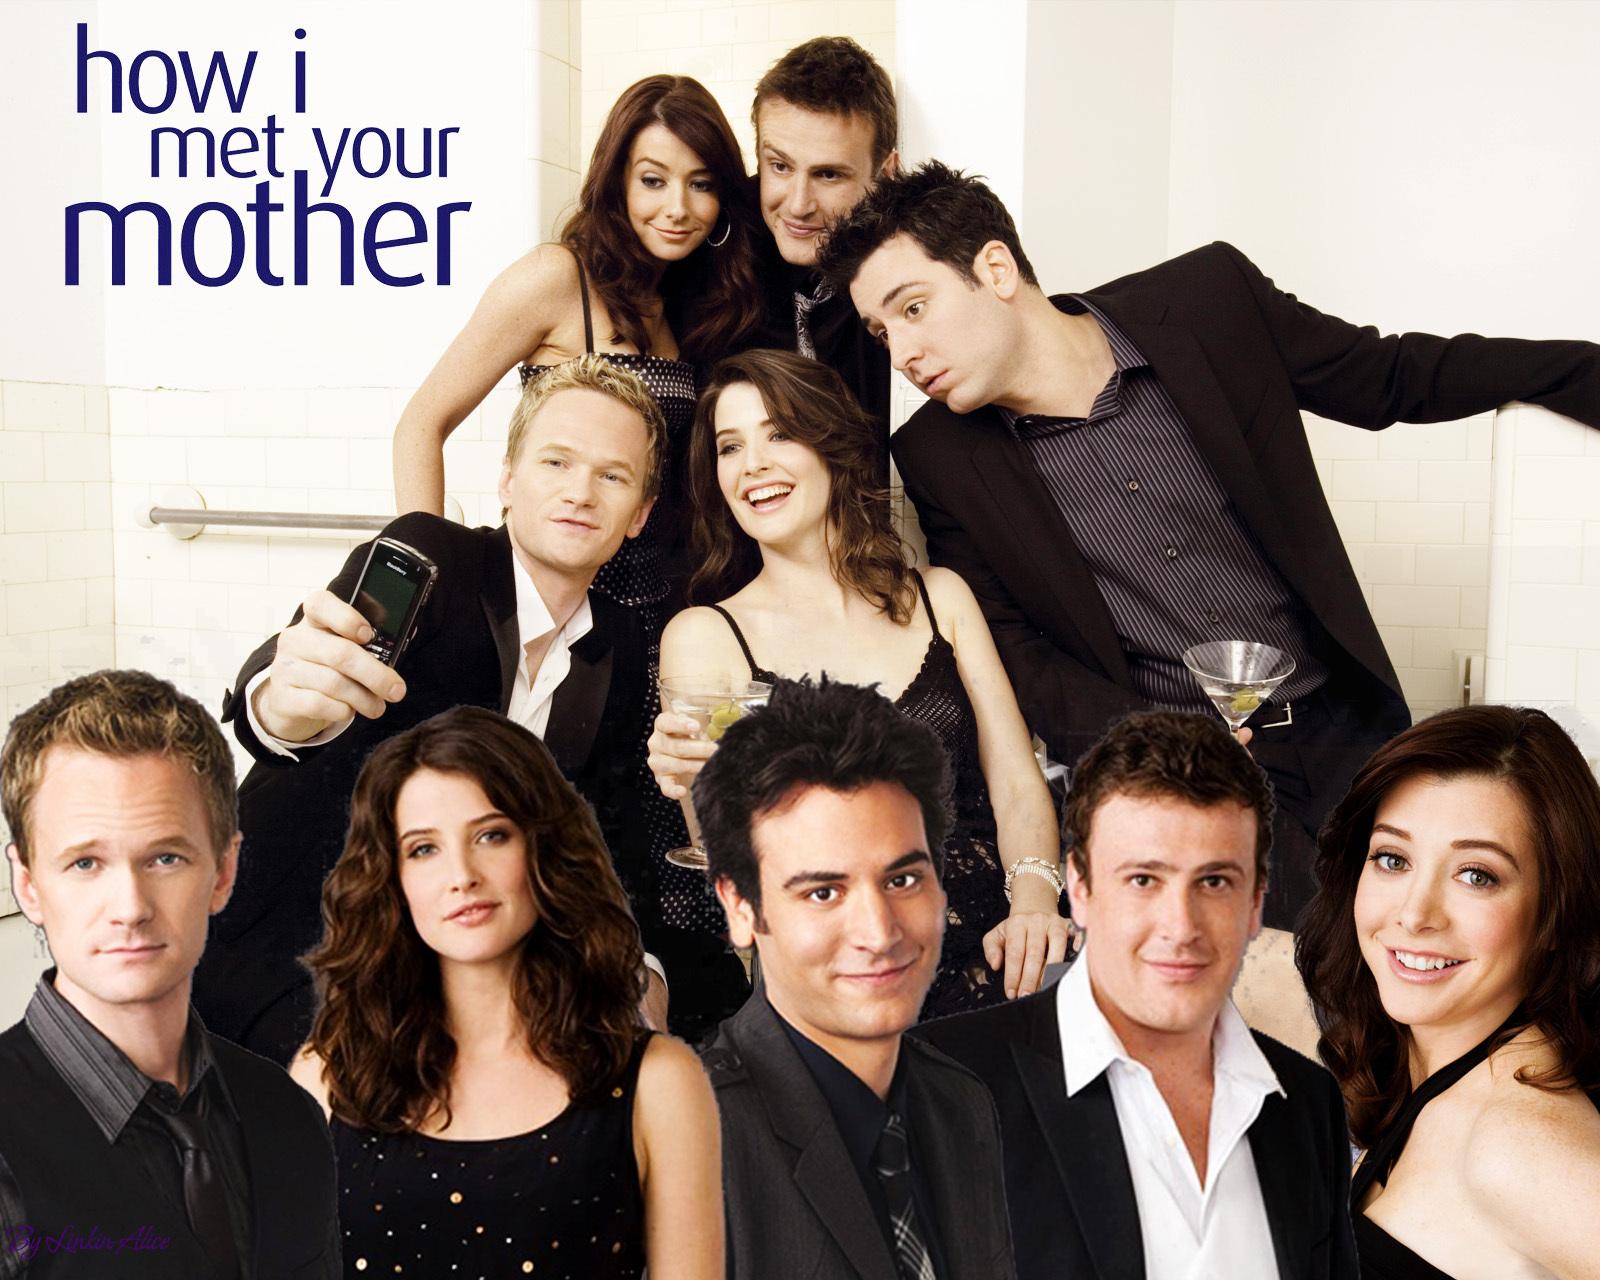 """How I Met Your Mother"" Star Josh Radnor to Visit UCF"